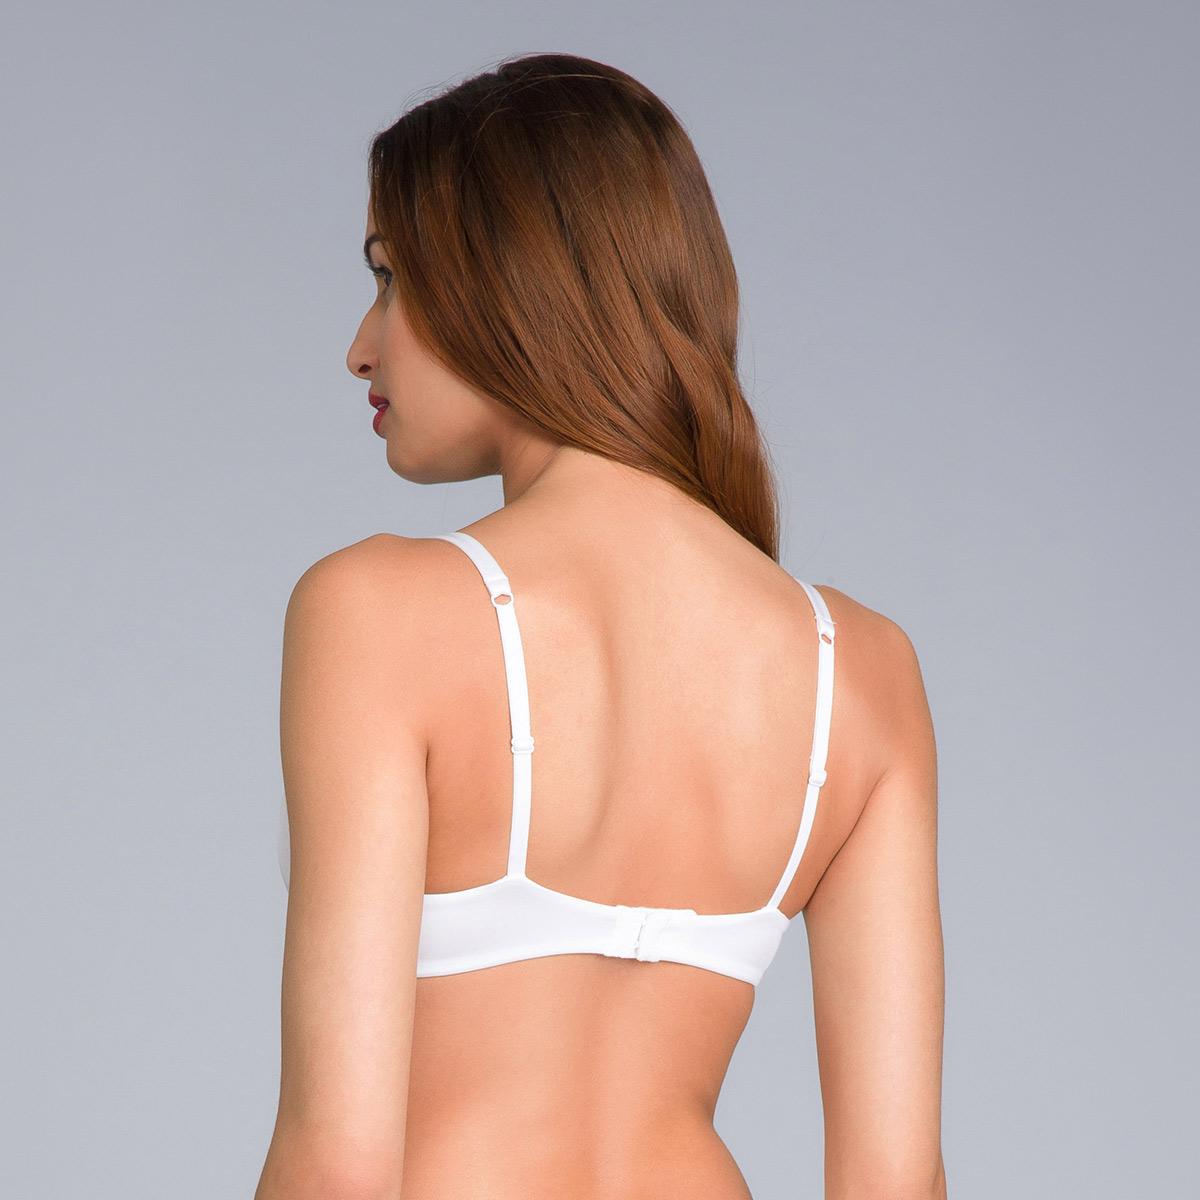 Soutien-gorge blanc armatures amovibles – 24h Soft Absolu-PLAYTEX